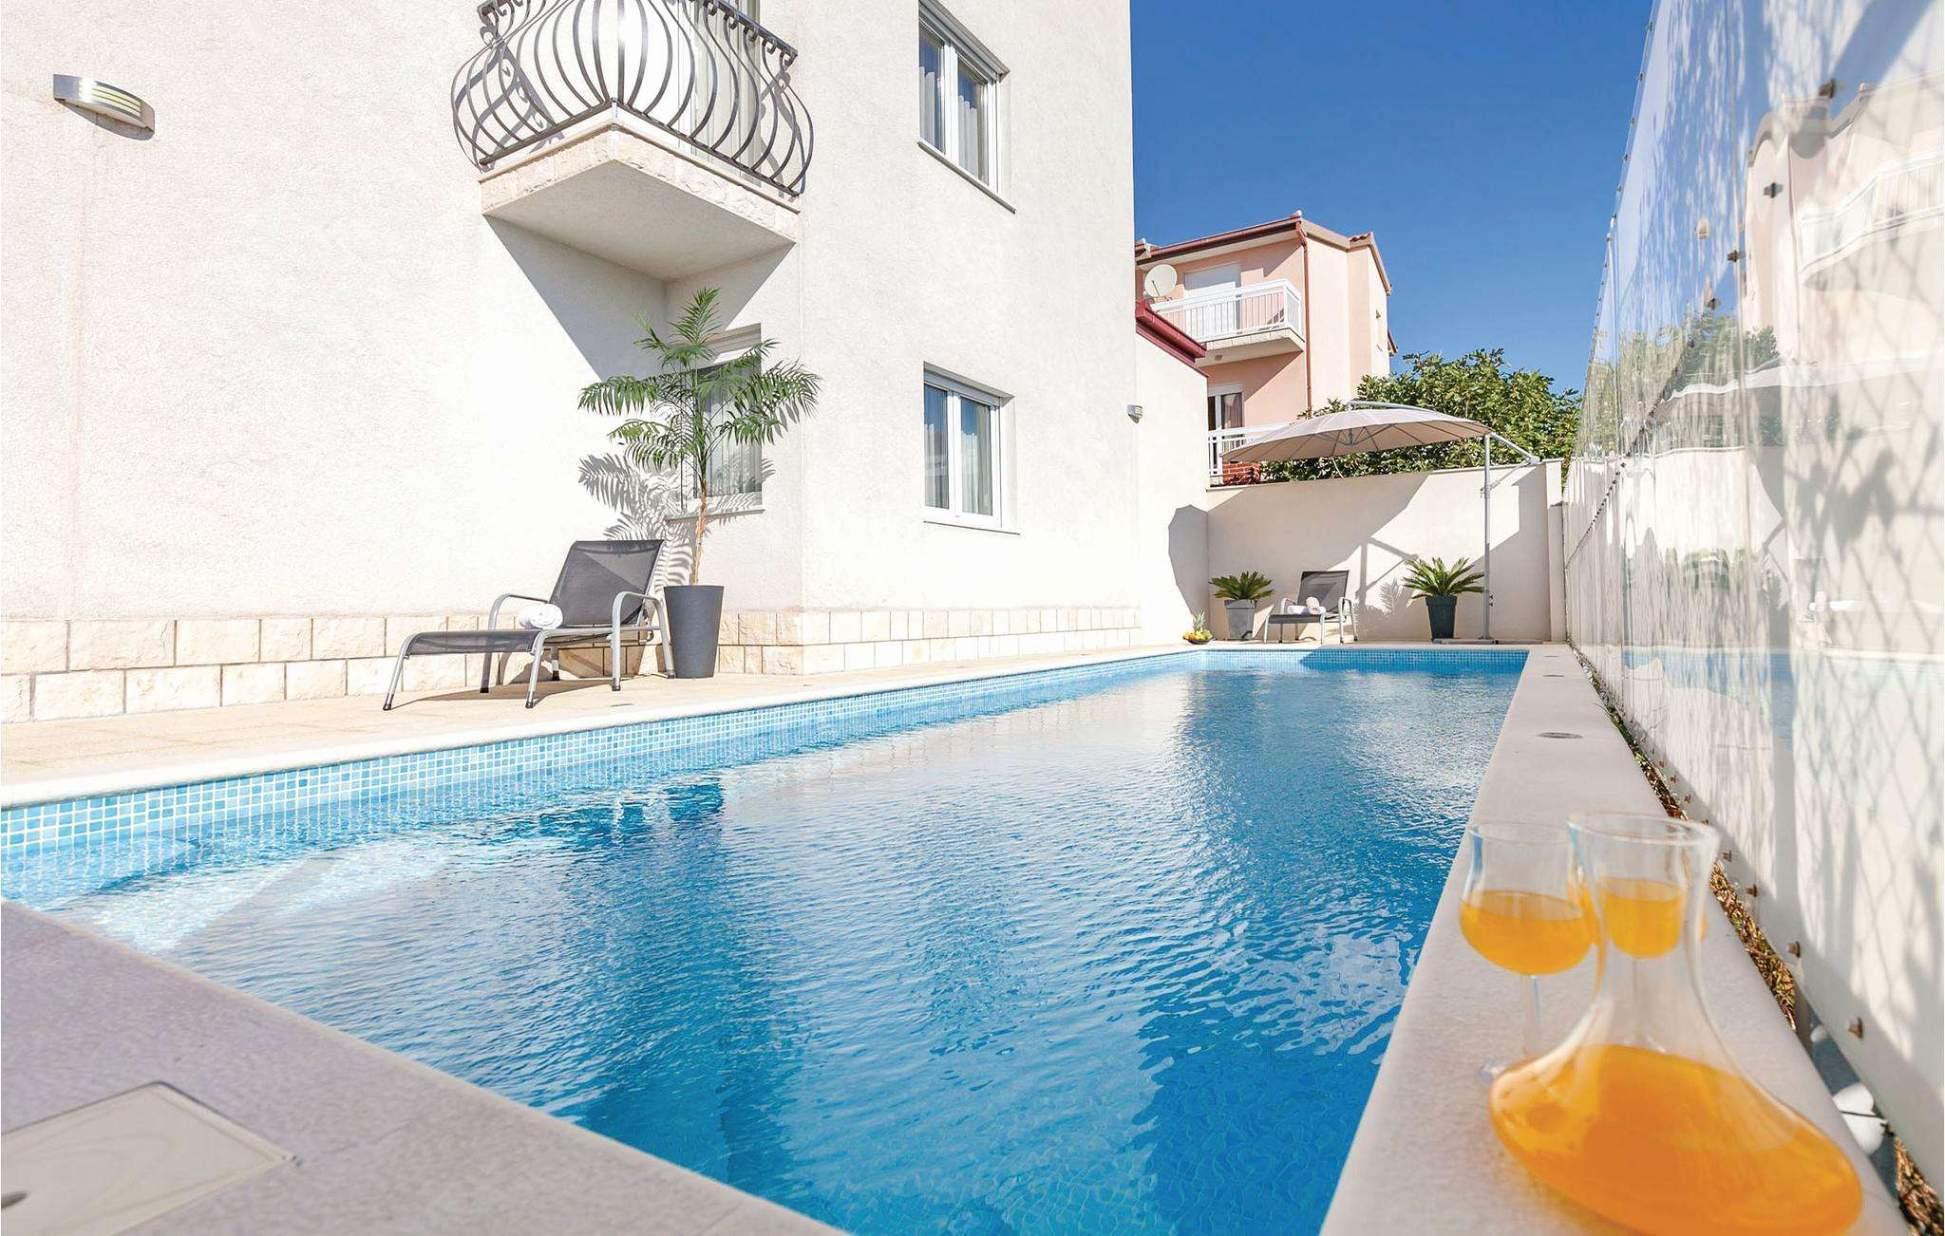 swimmingpool im garten neu kletterturm garten 0d tags marvelous pool bilder inspiration pool bilder inspiration